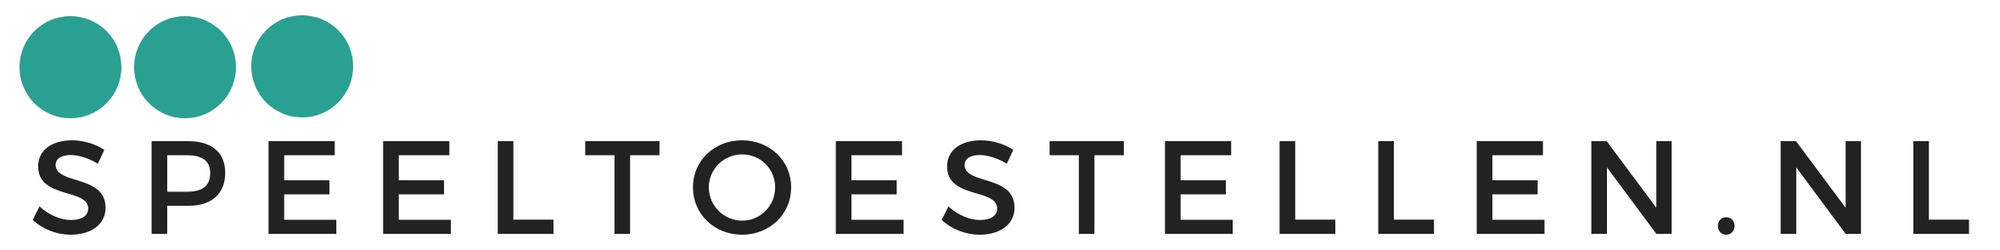 Speeltoestellen - Logo